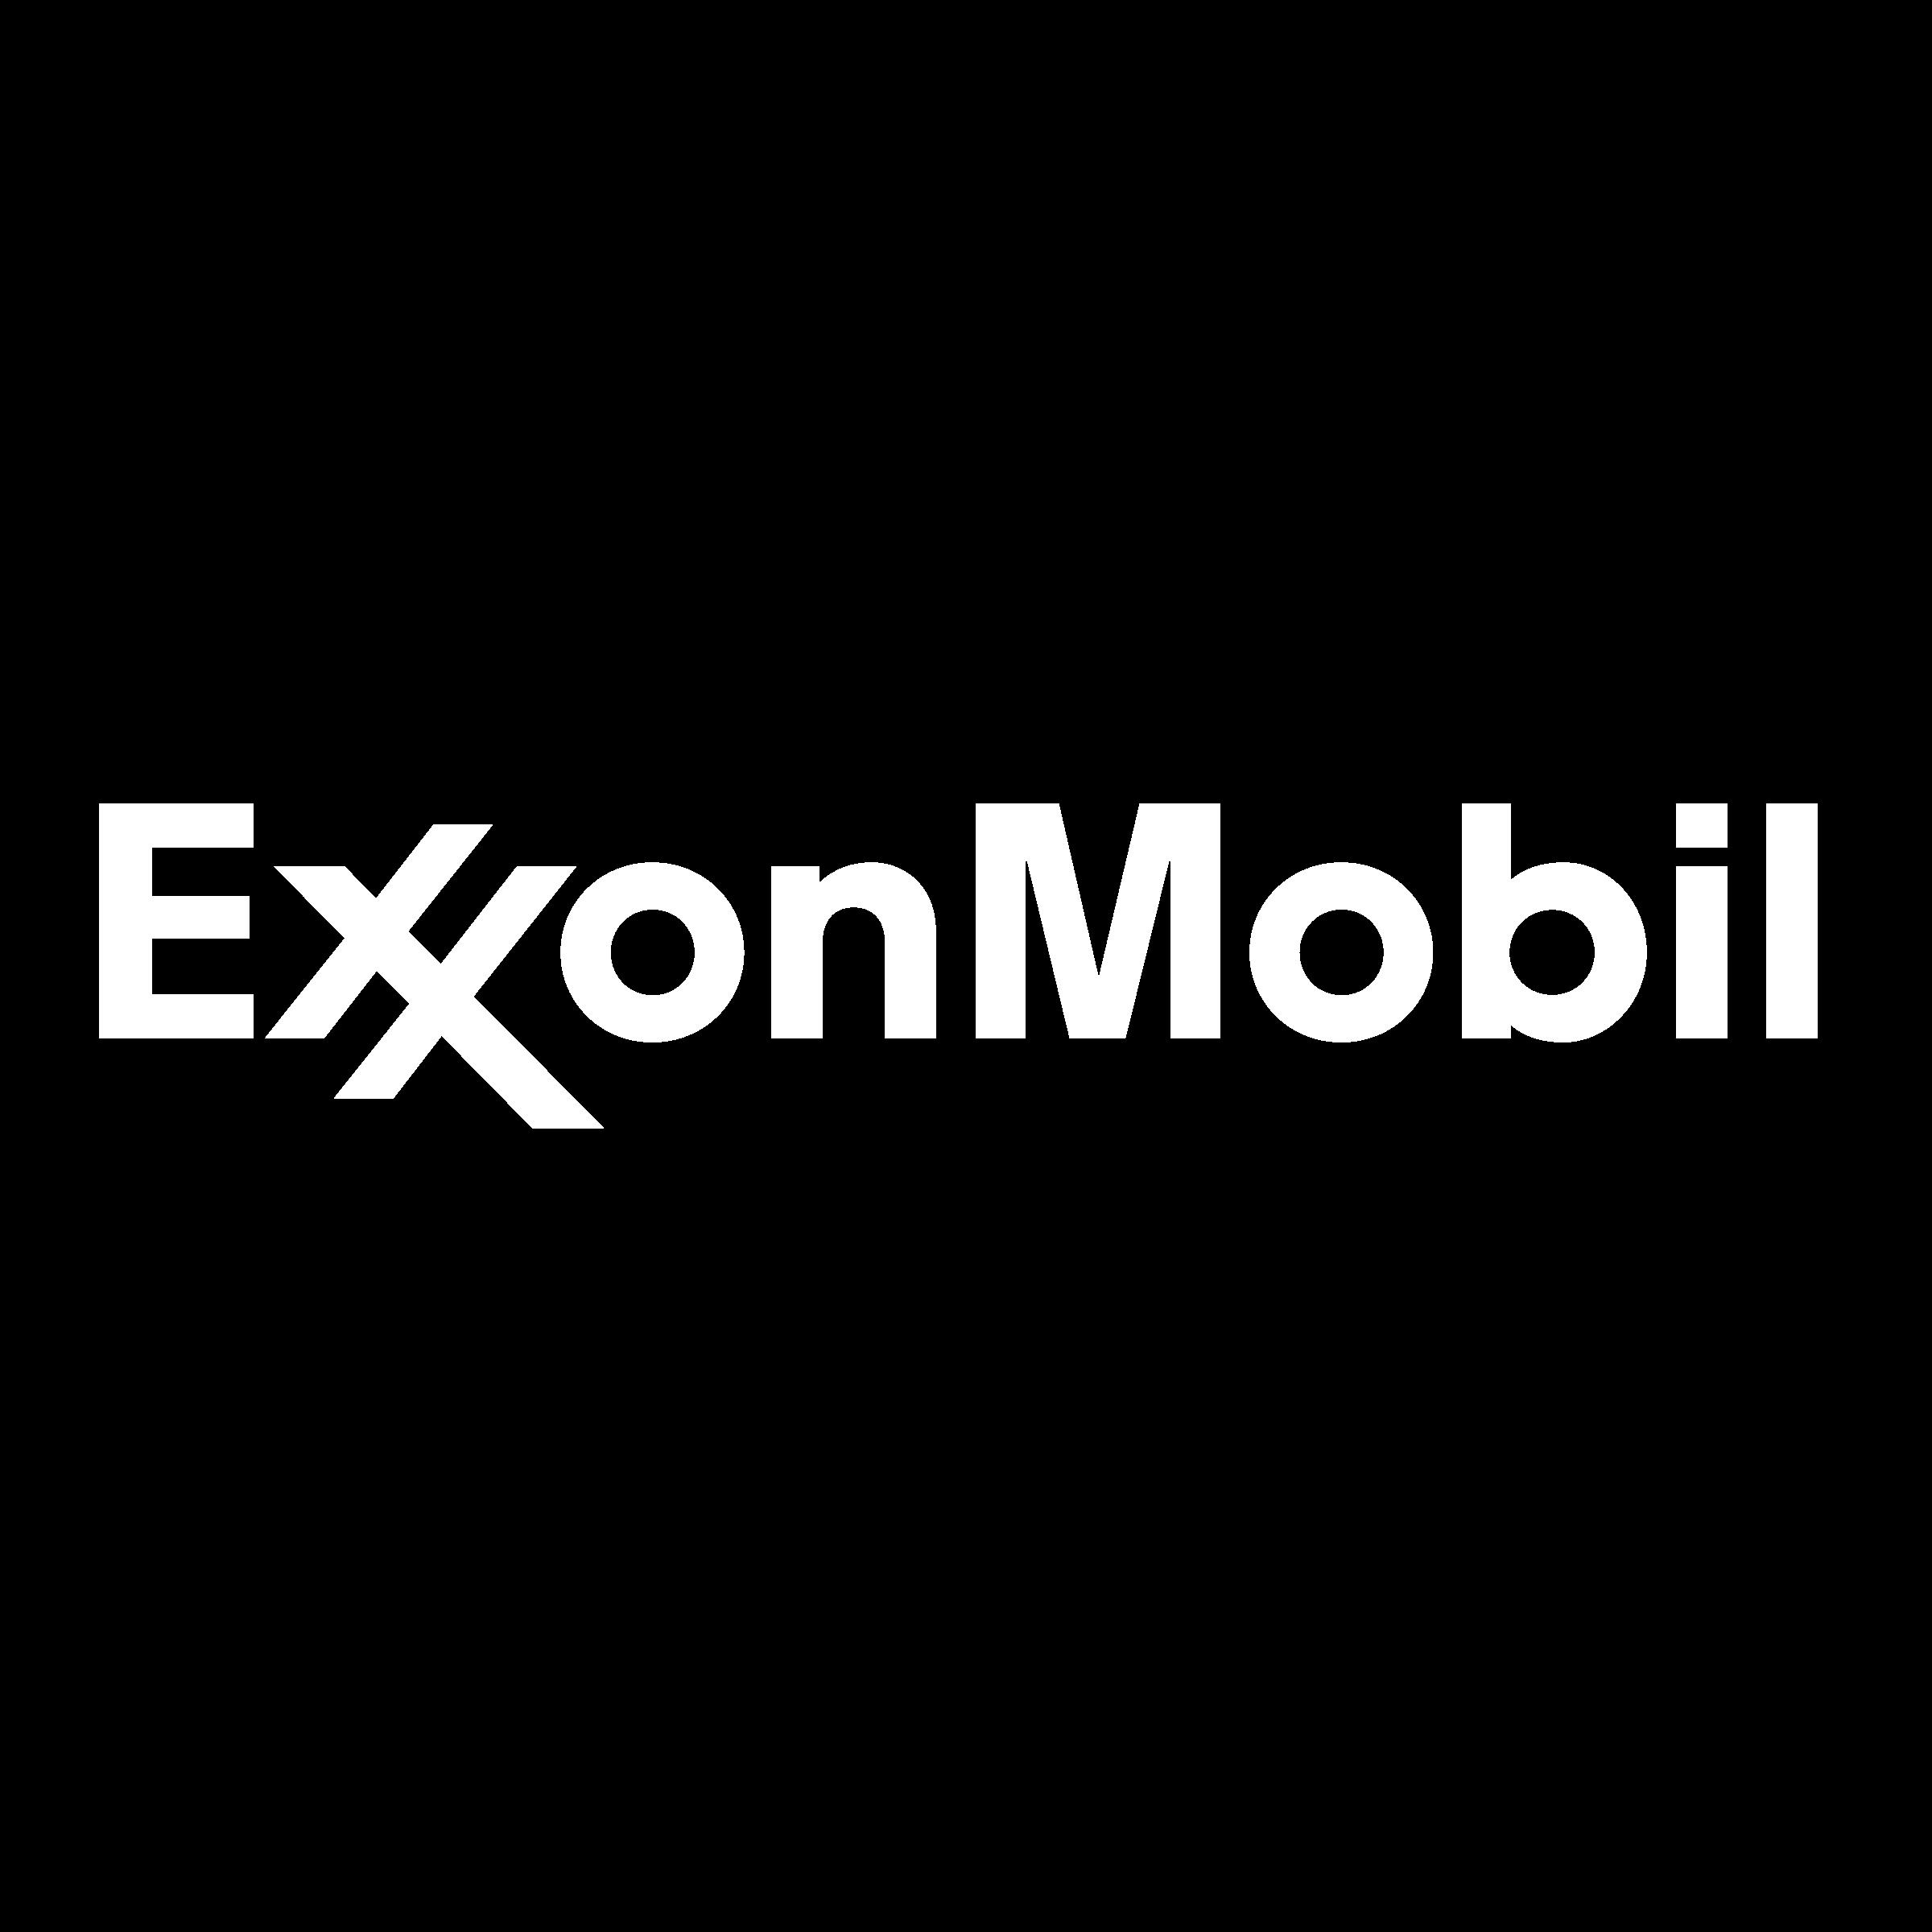 Exxon Mobil Logo PNG Transparent & SVG Vector - Freebie Supply